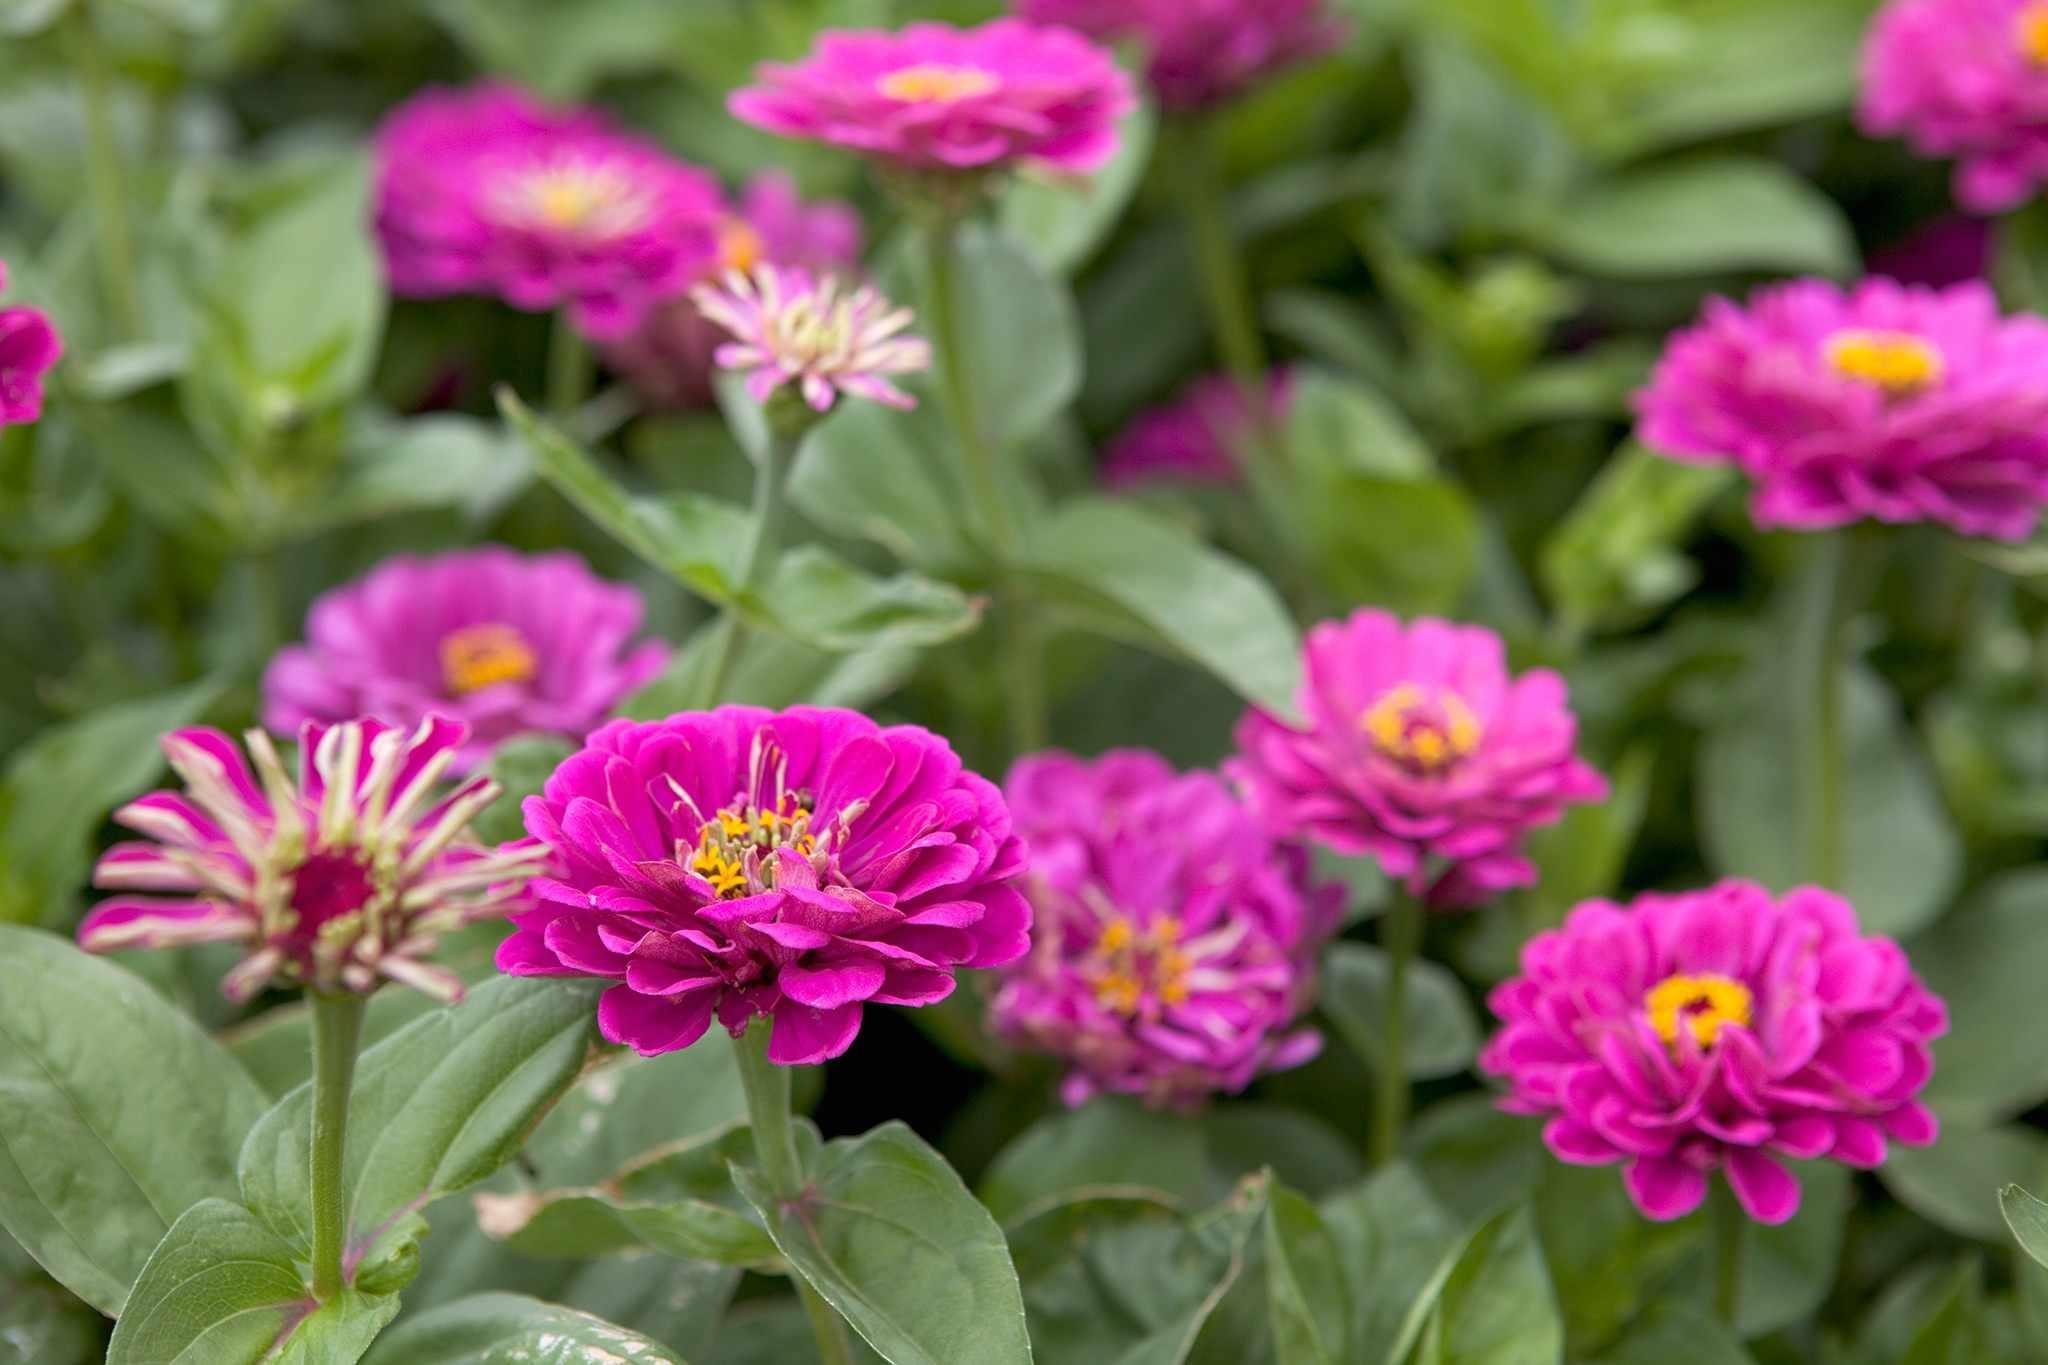 Purple-pink flowers of zinnia 'Purple Prince'